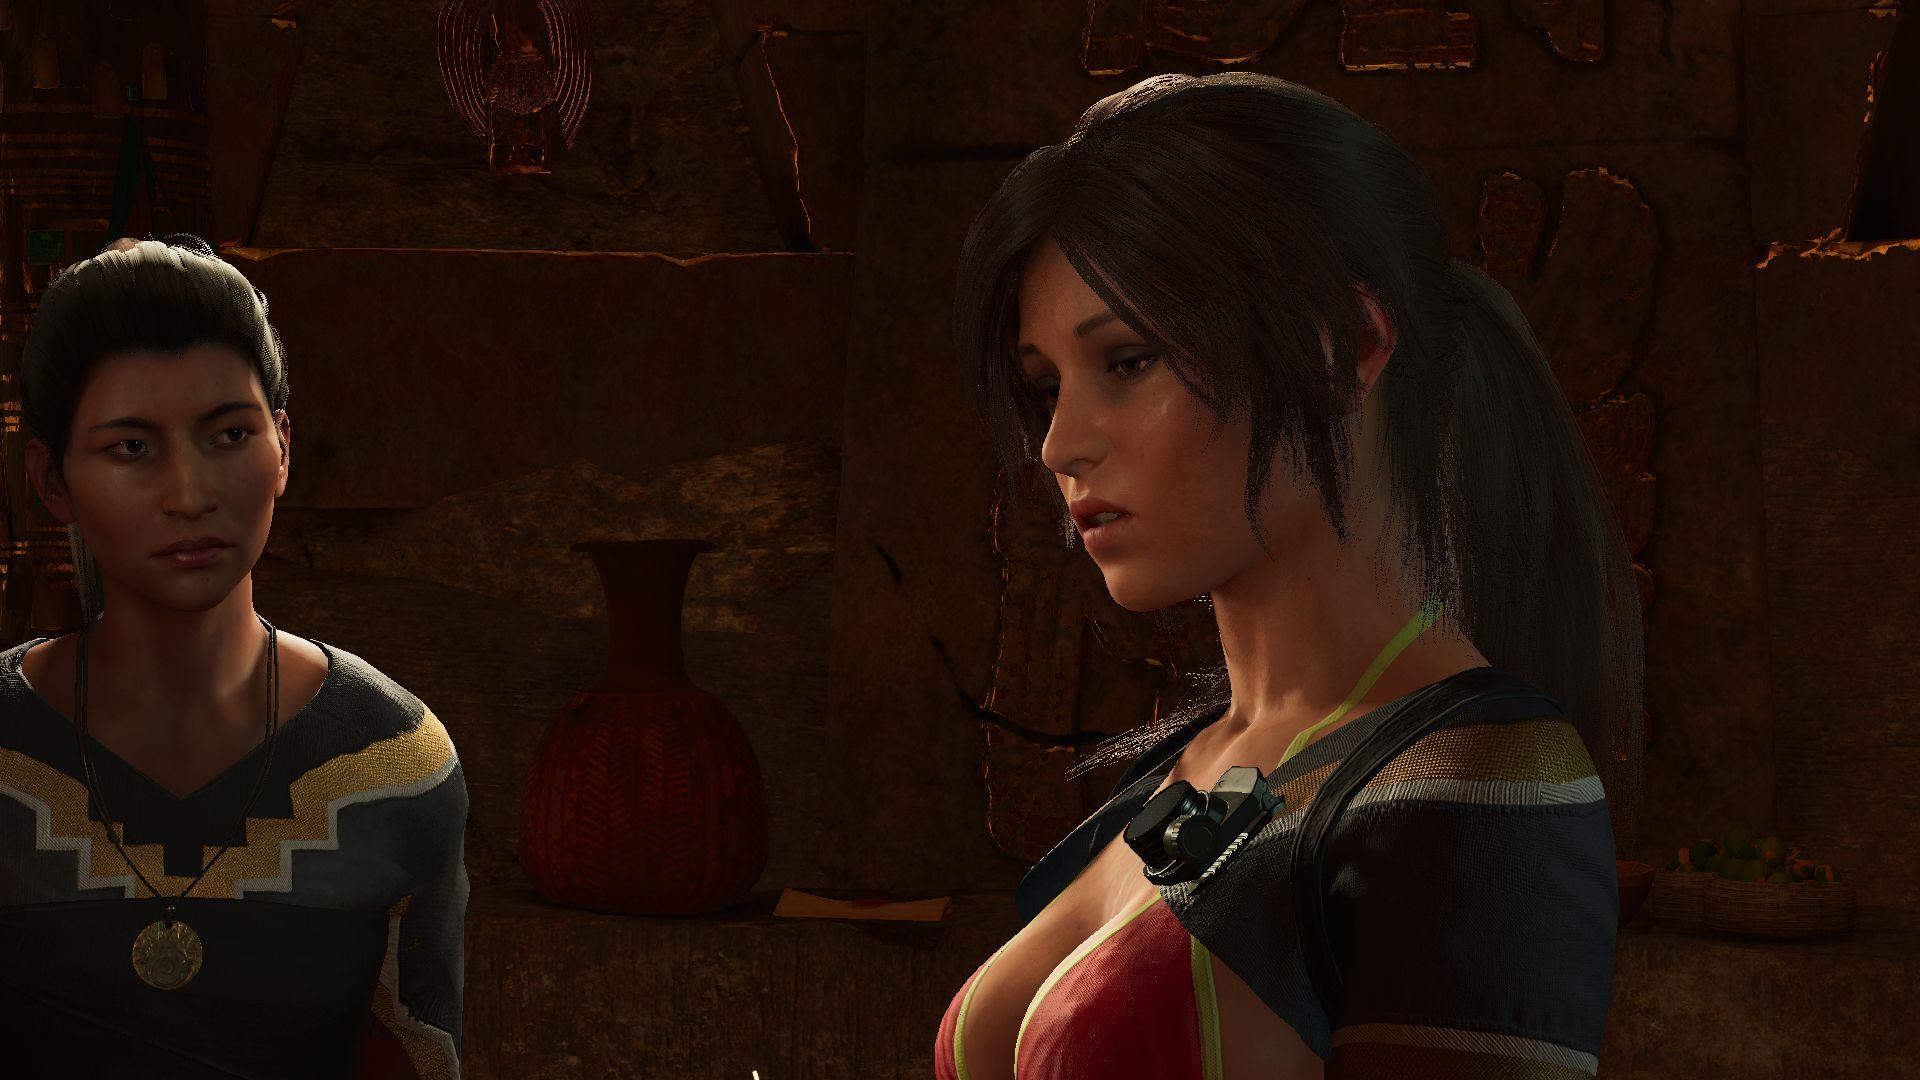 000758.Jpg - Shadow of the Tomb Raider